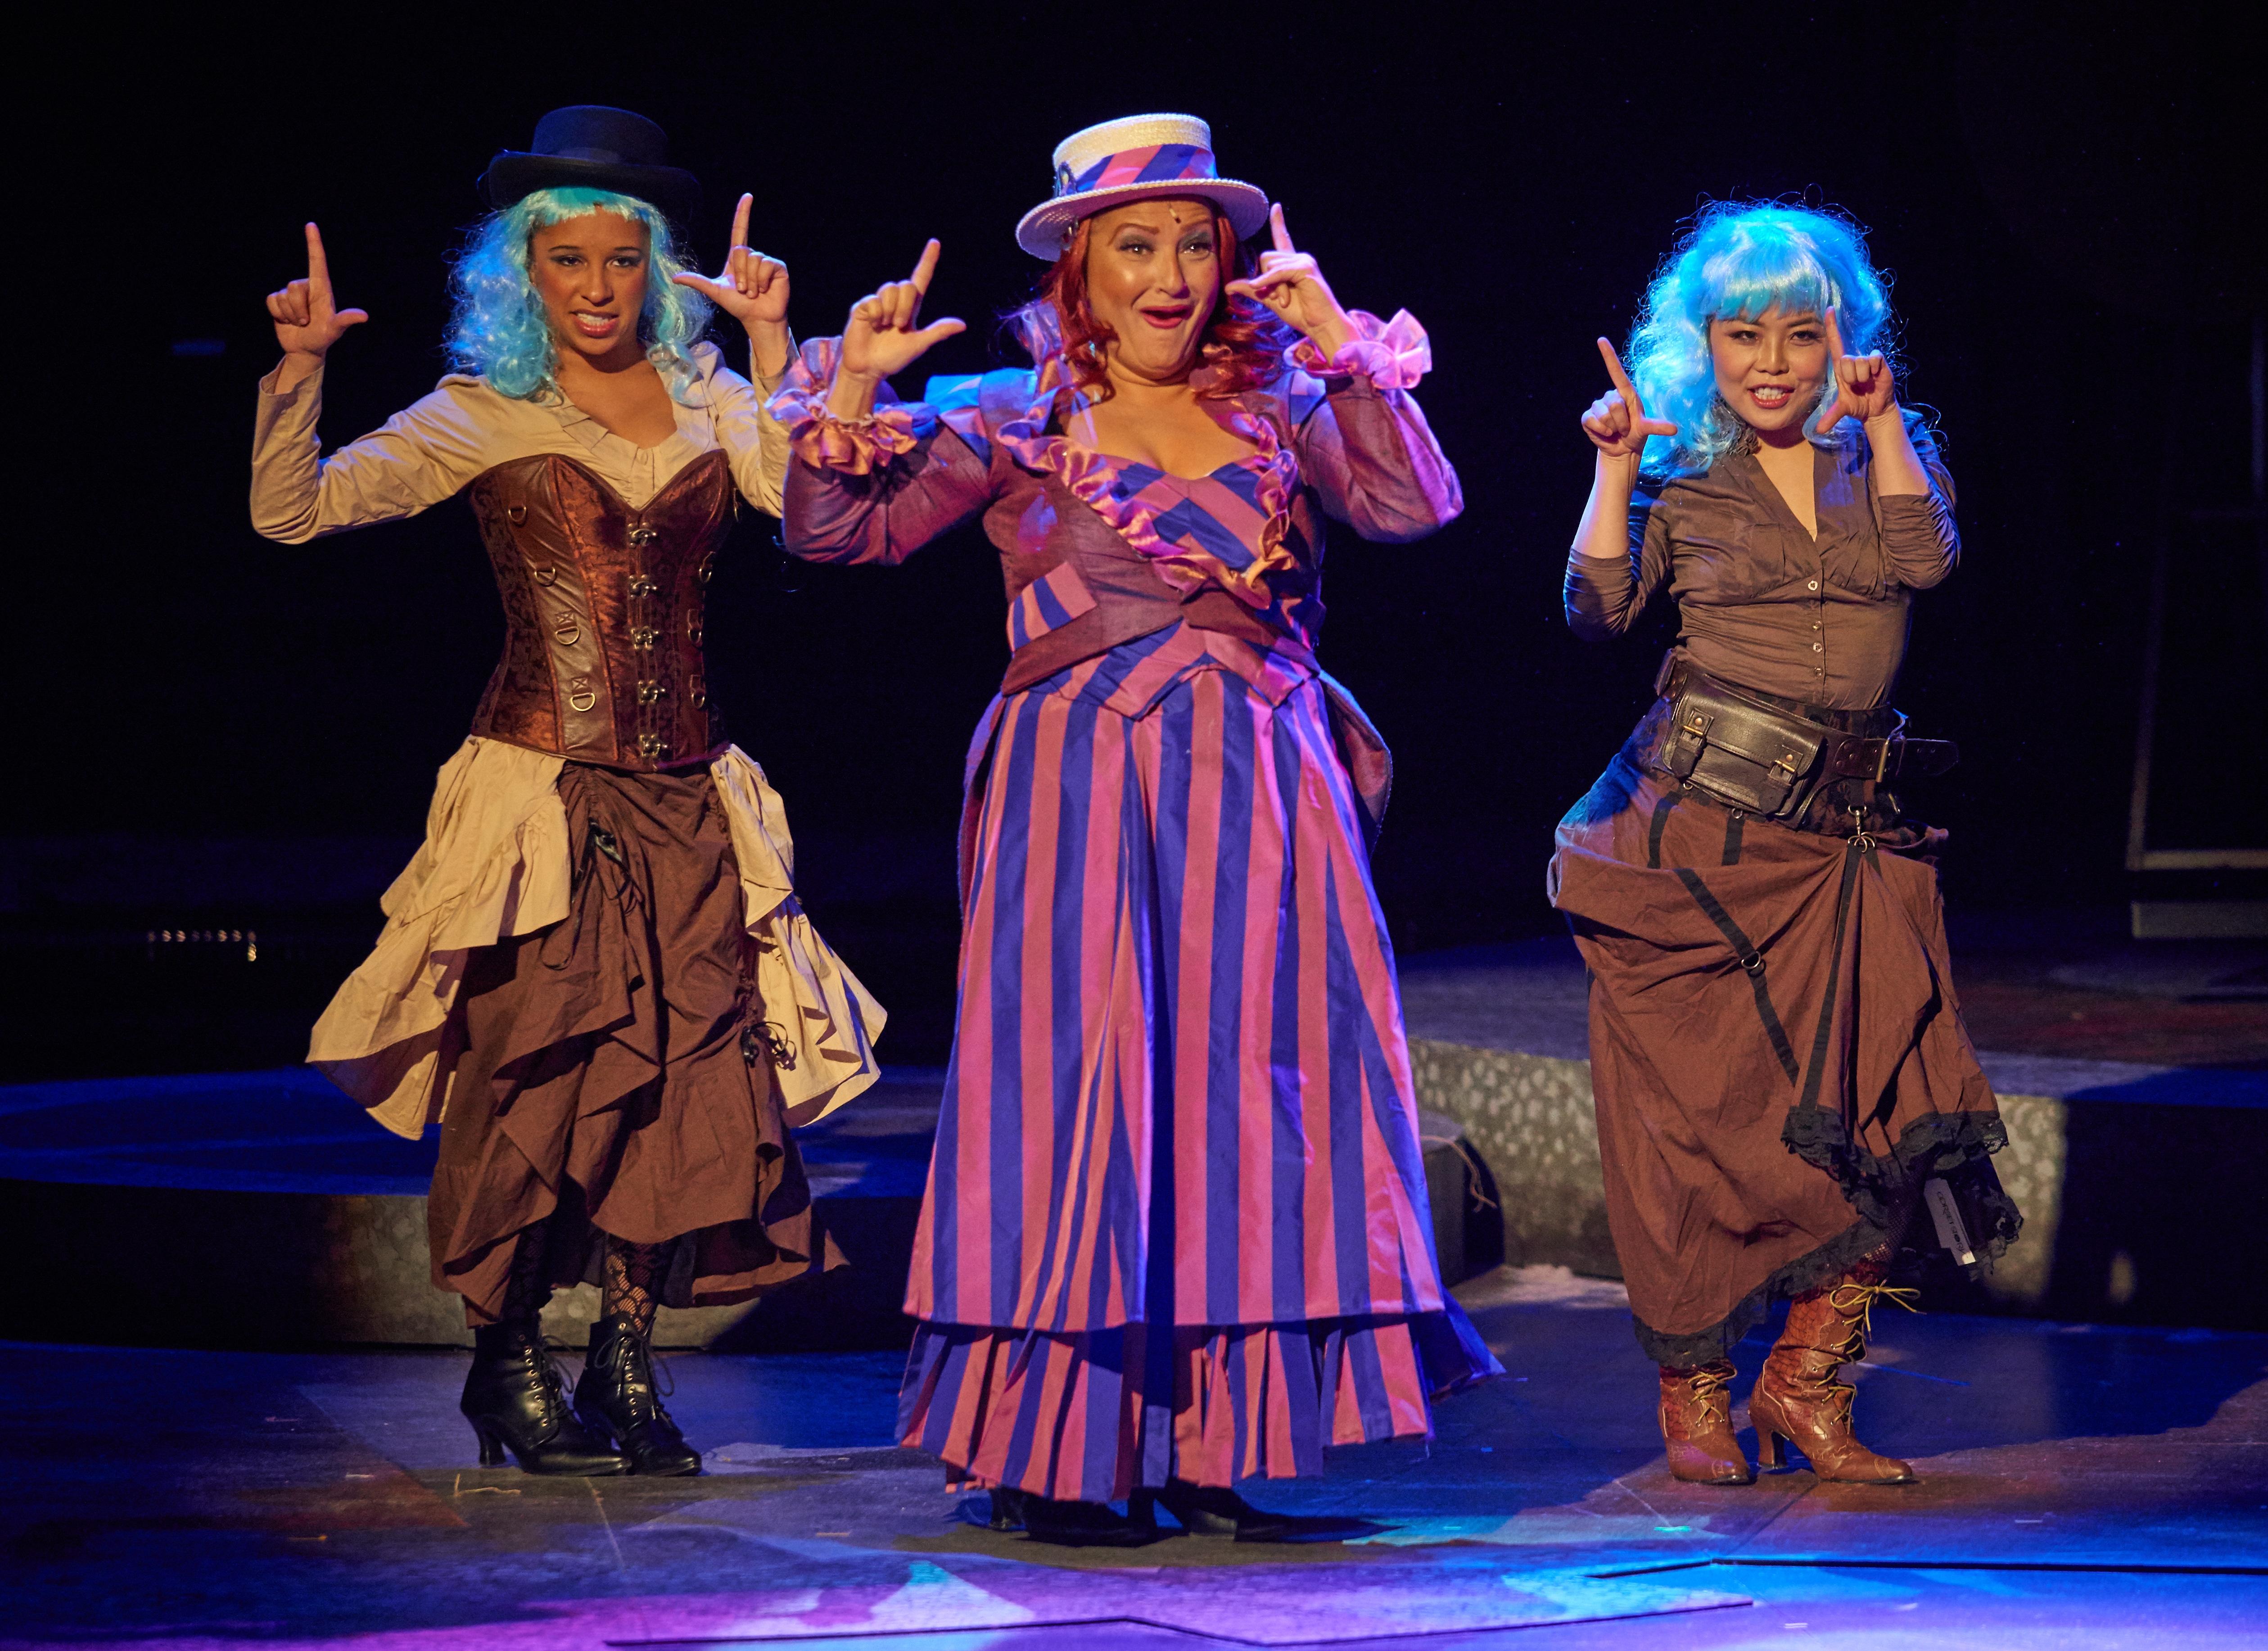 Fiddlehead's 'The Wiz' is a warm, winning musical